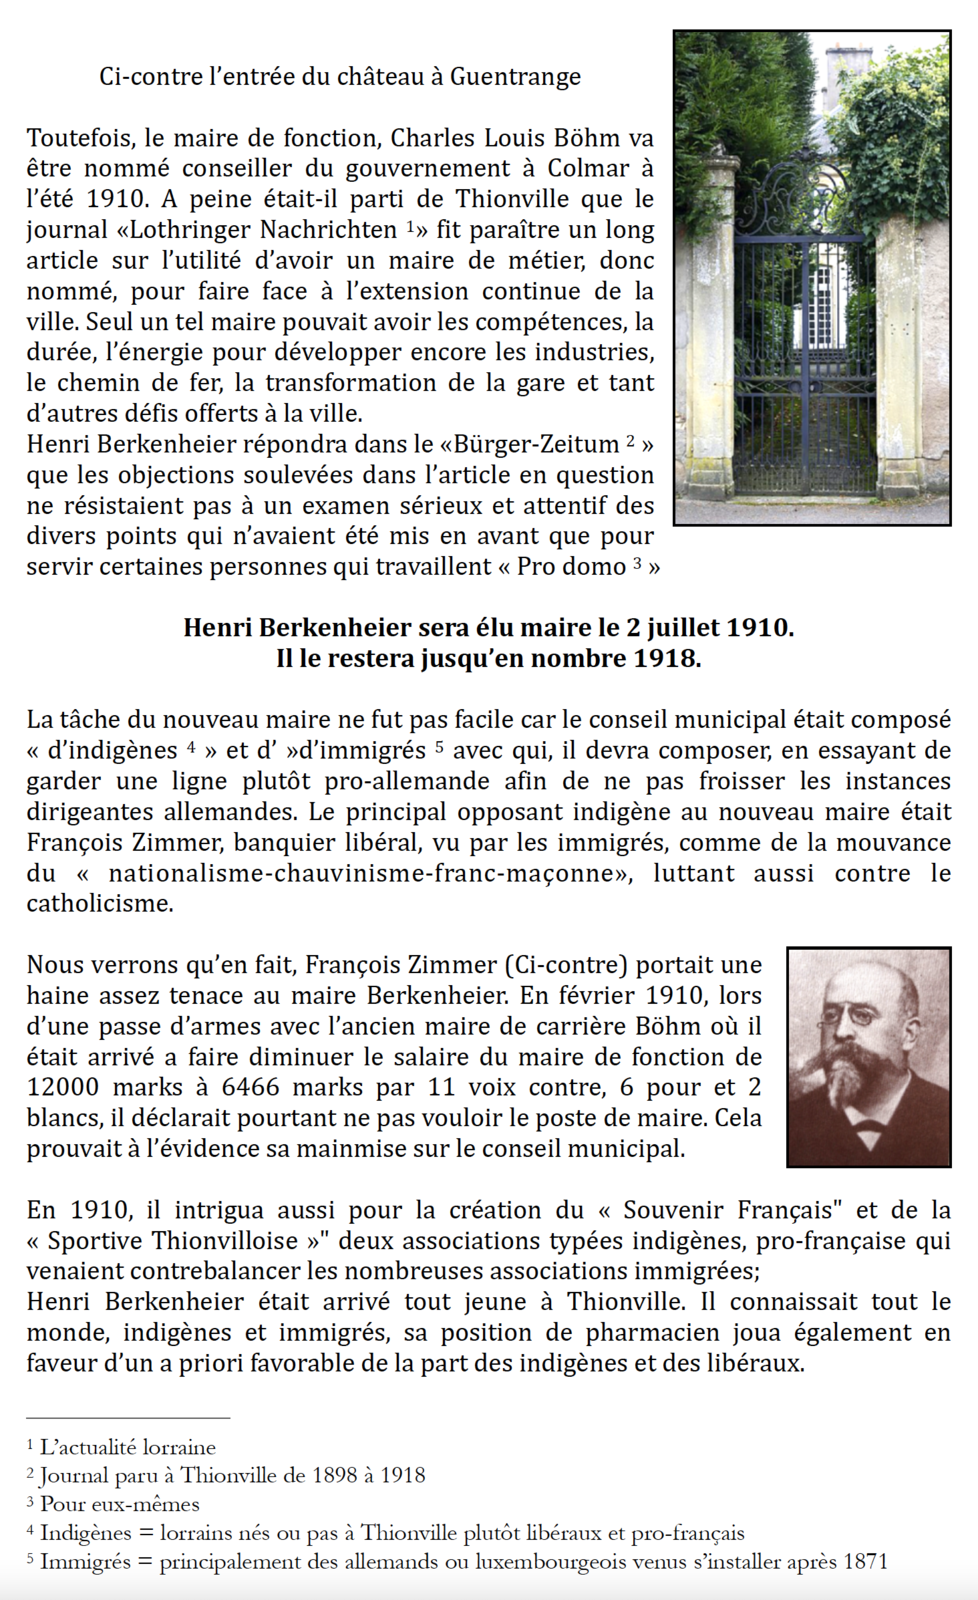 1910 à 1918 - Heinrich BERKENHEIER, maire de Thionville.